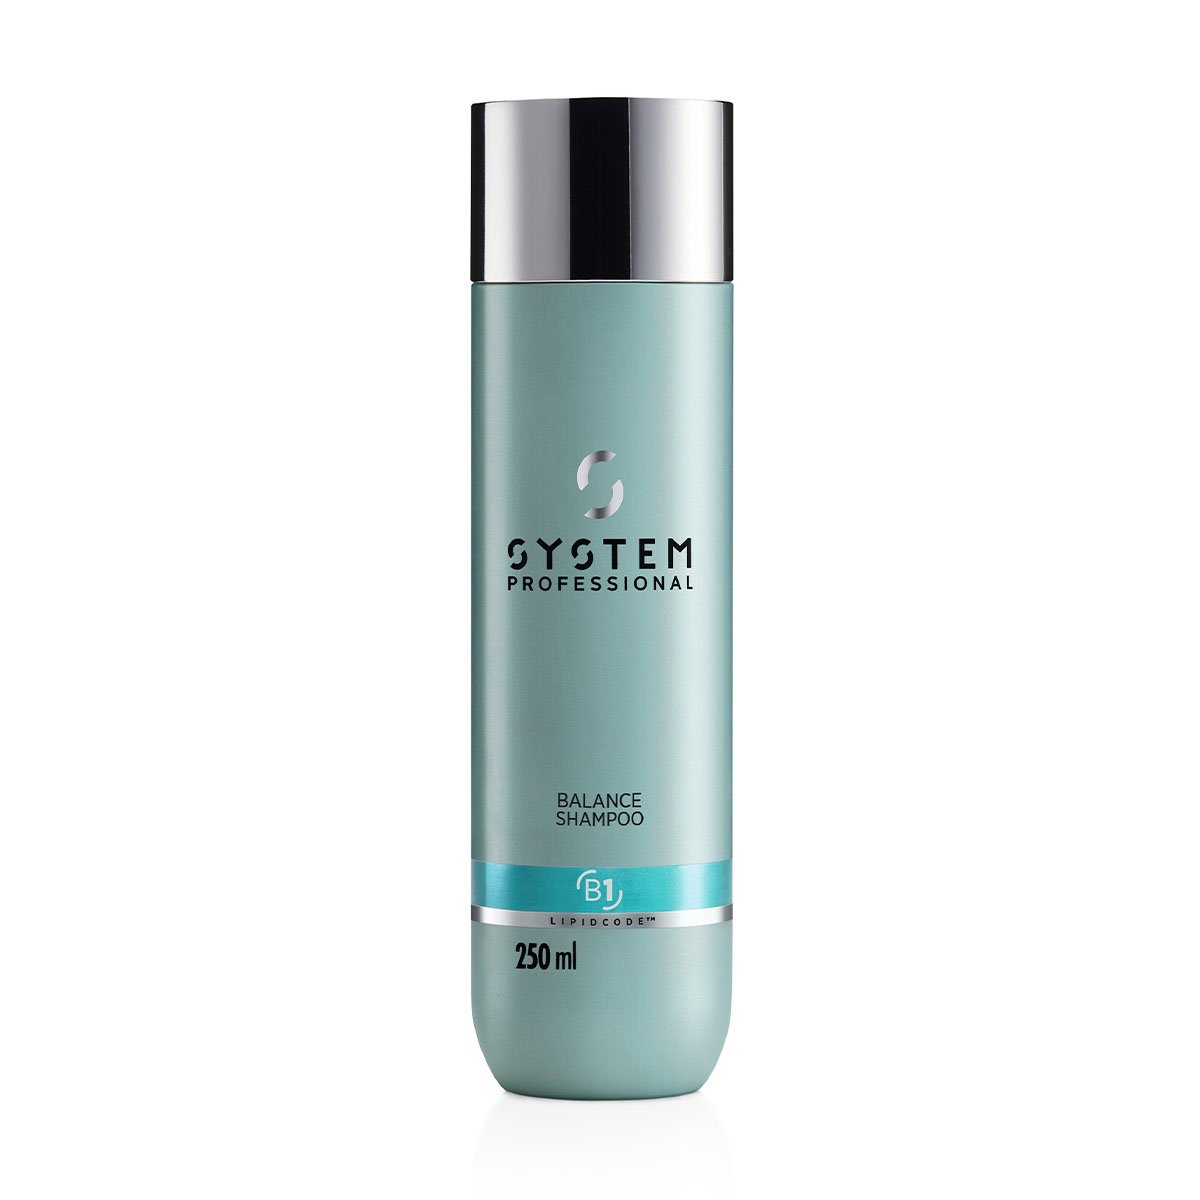 System Professional Colour Save Balance Shampoo